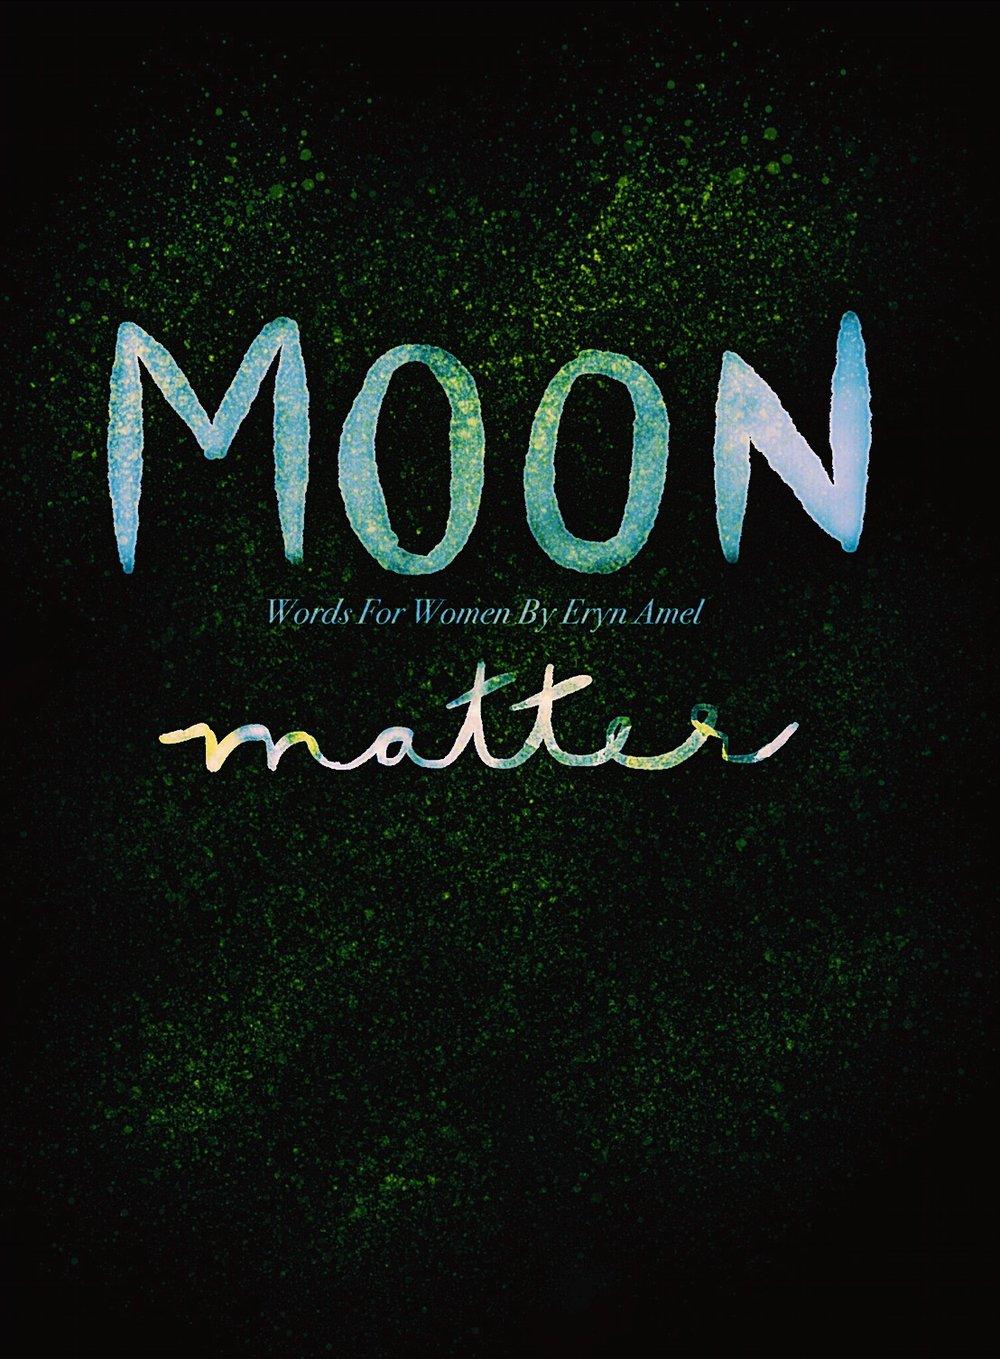 Image of Moon Matter